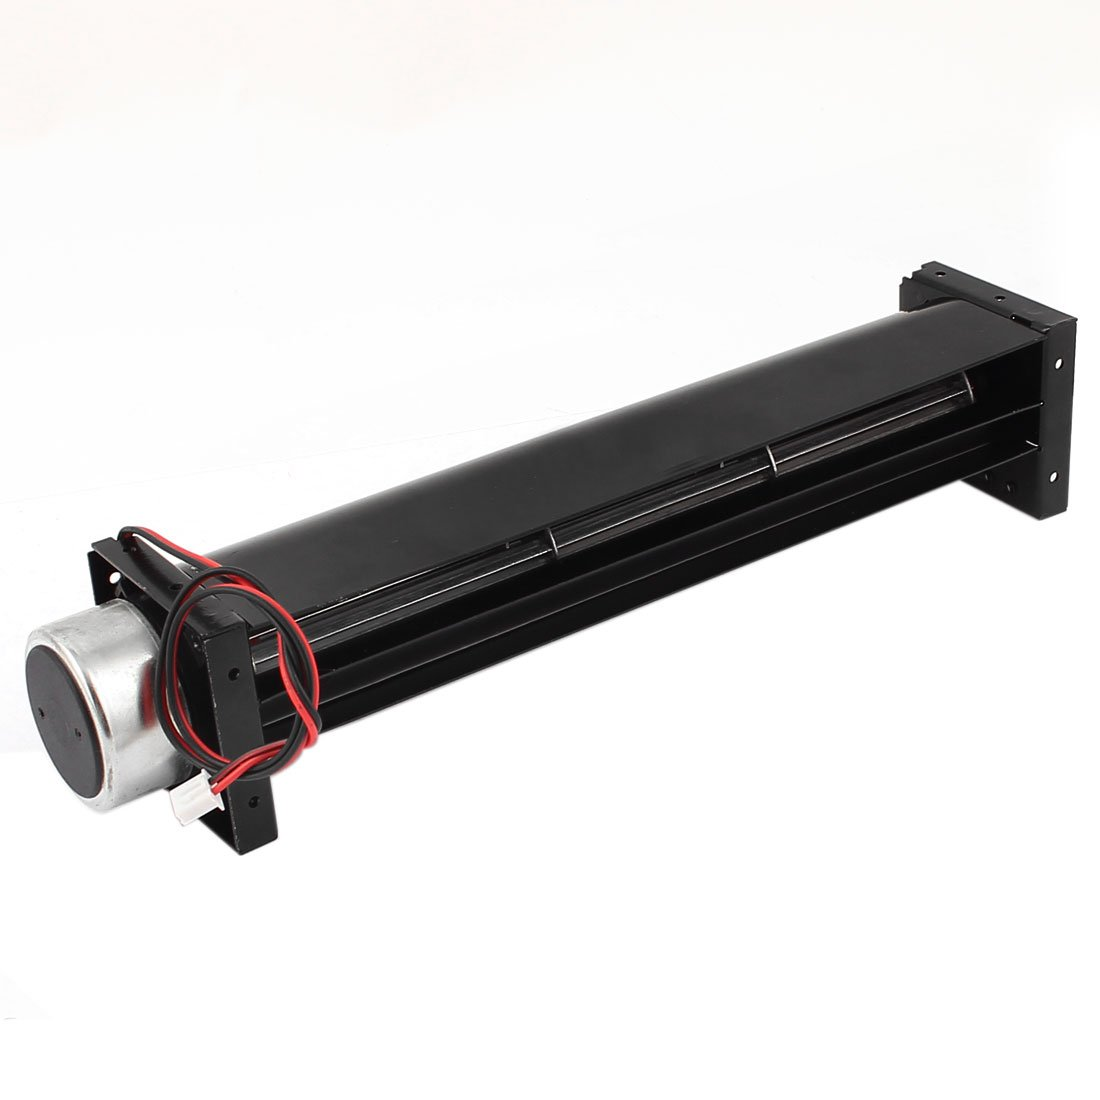 uxcell DC 12V 0.2A Cross Flow Cooling Fan Heat Exchanger Amplifier Cool Turbo